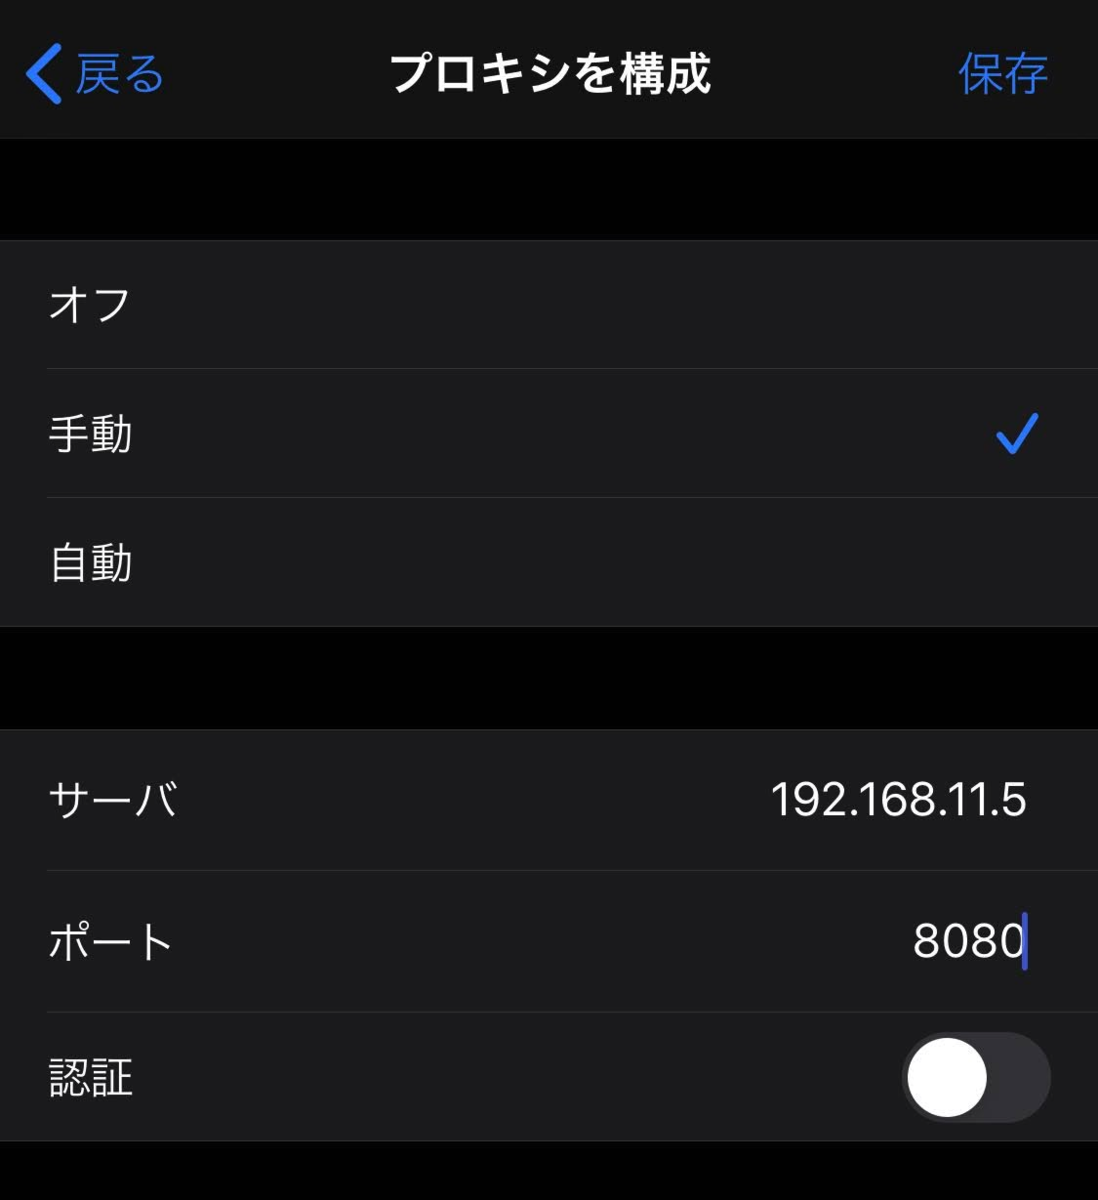 f:id:yoshiki_utakata:20200311111313p:plain